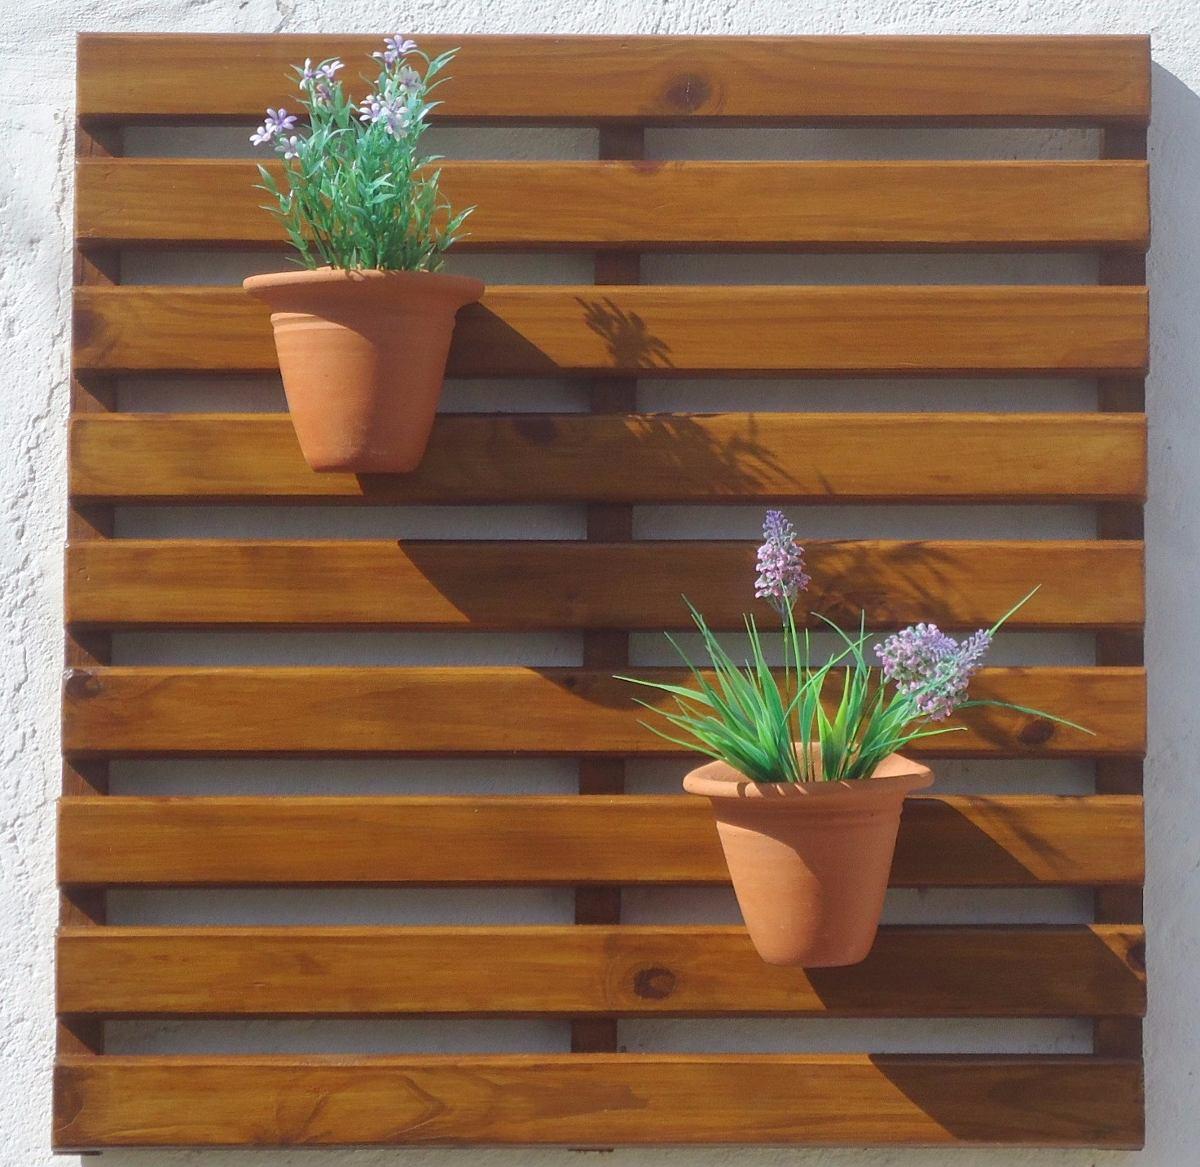 Painel De Madeira Para Jardim Vertical 75 (l) X 71 (a) Cm R$ 79 90  #986433 1200x1167